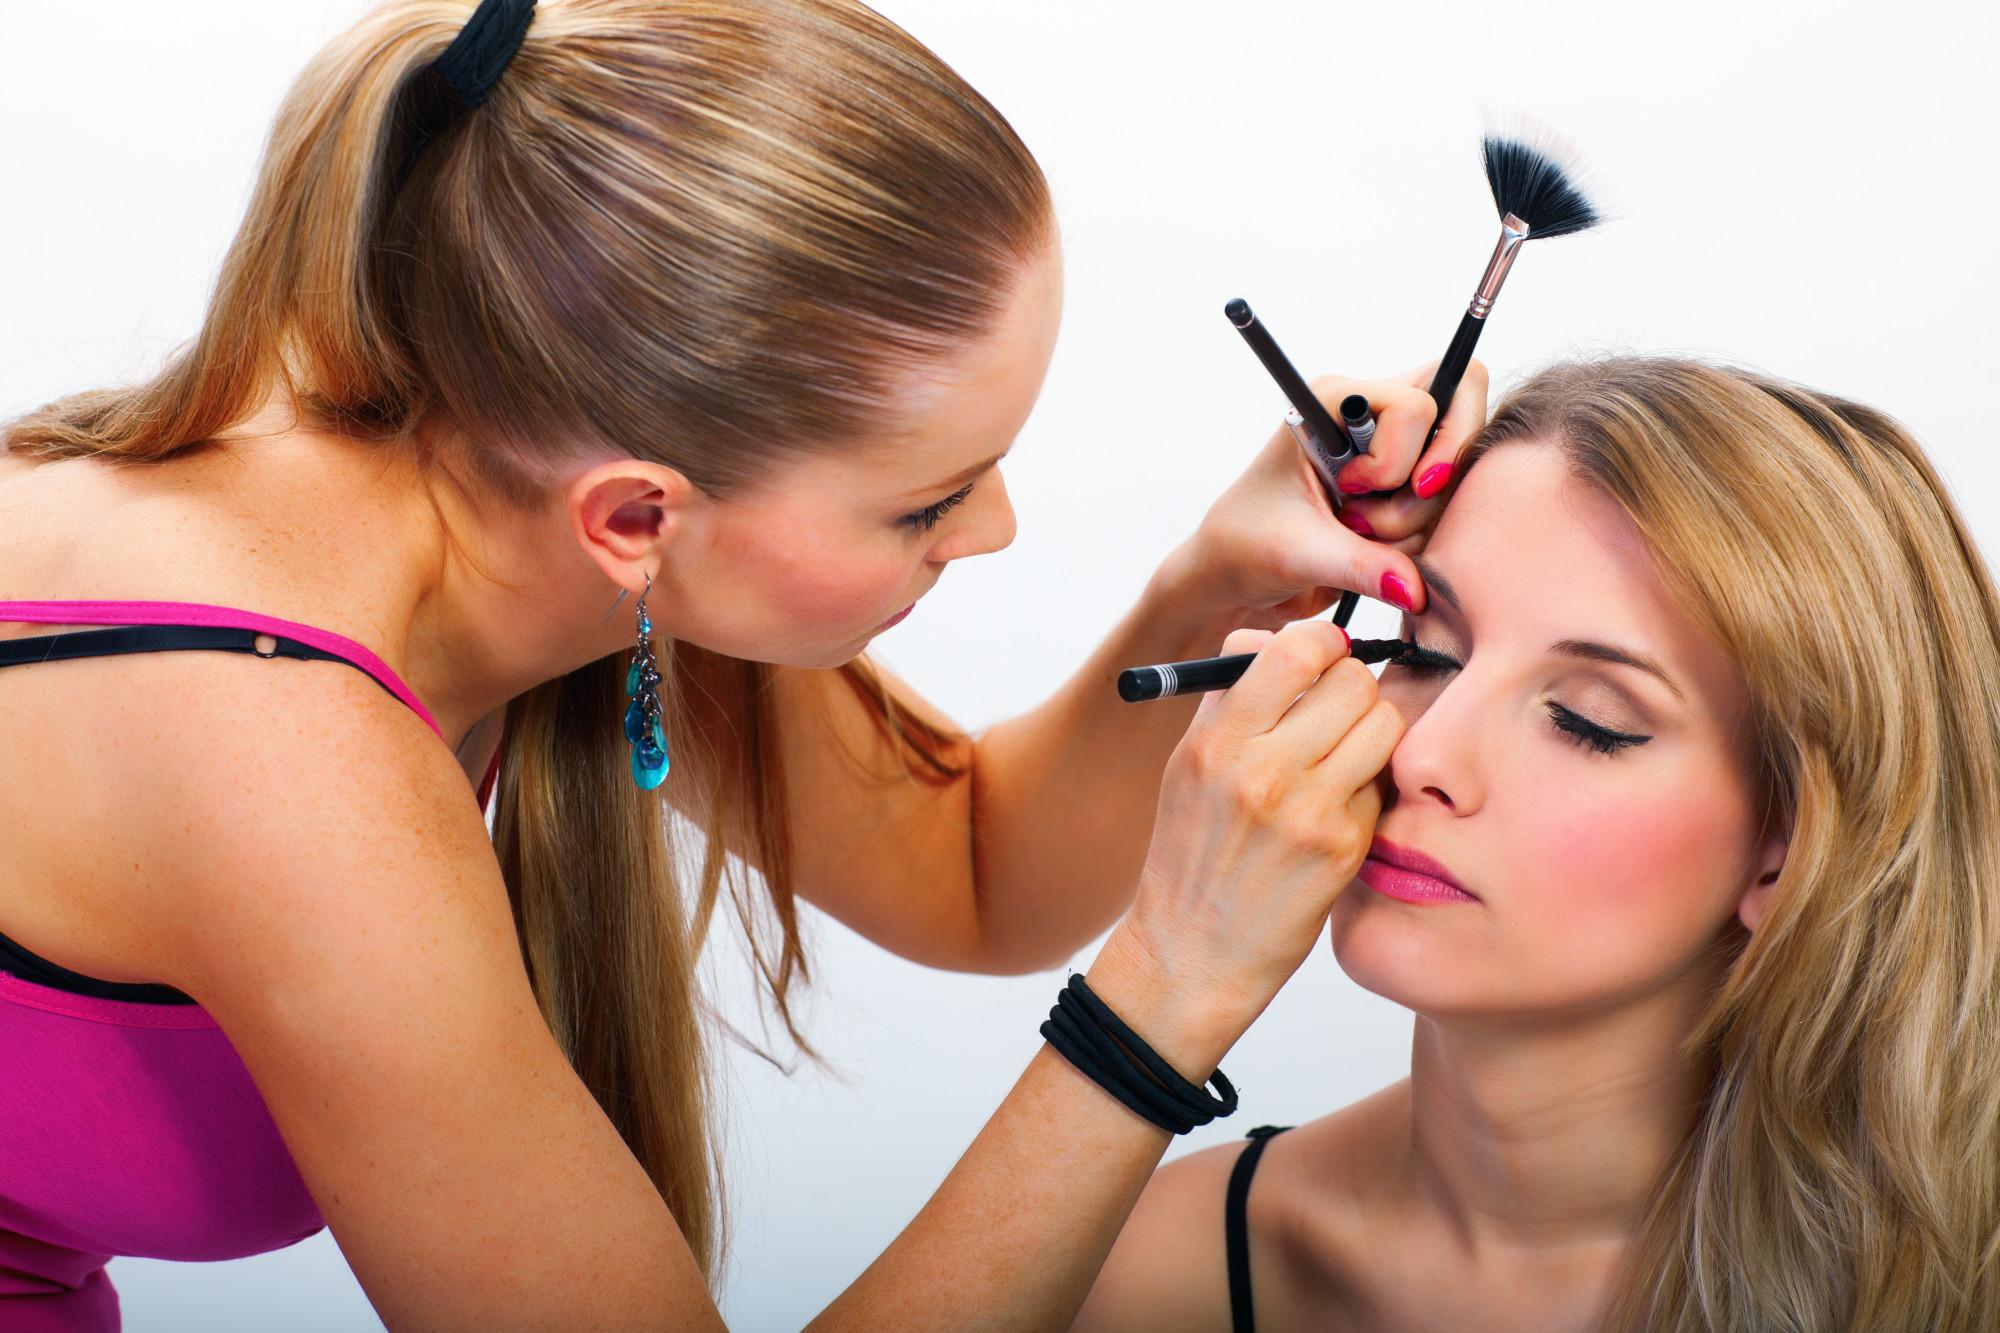 Make-up-for fun profumeria biologica bellabio ecochic gorizia